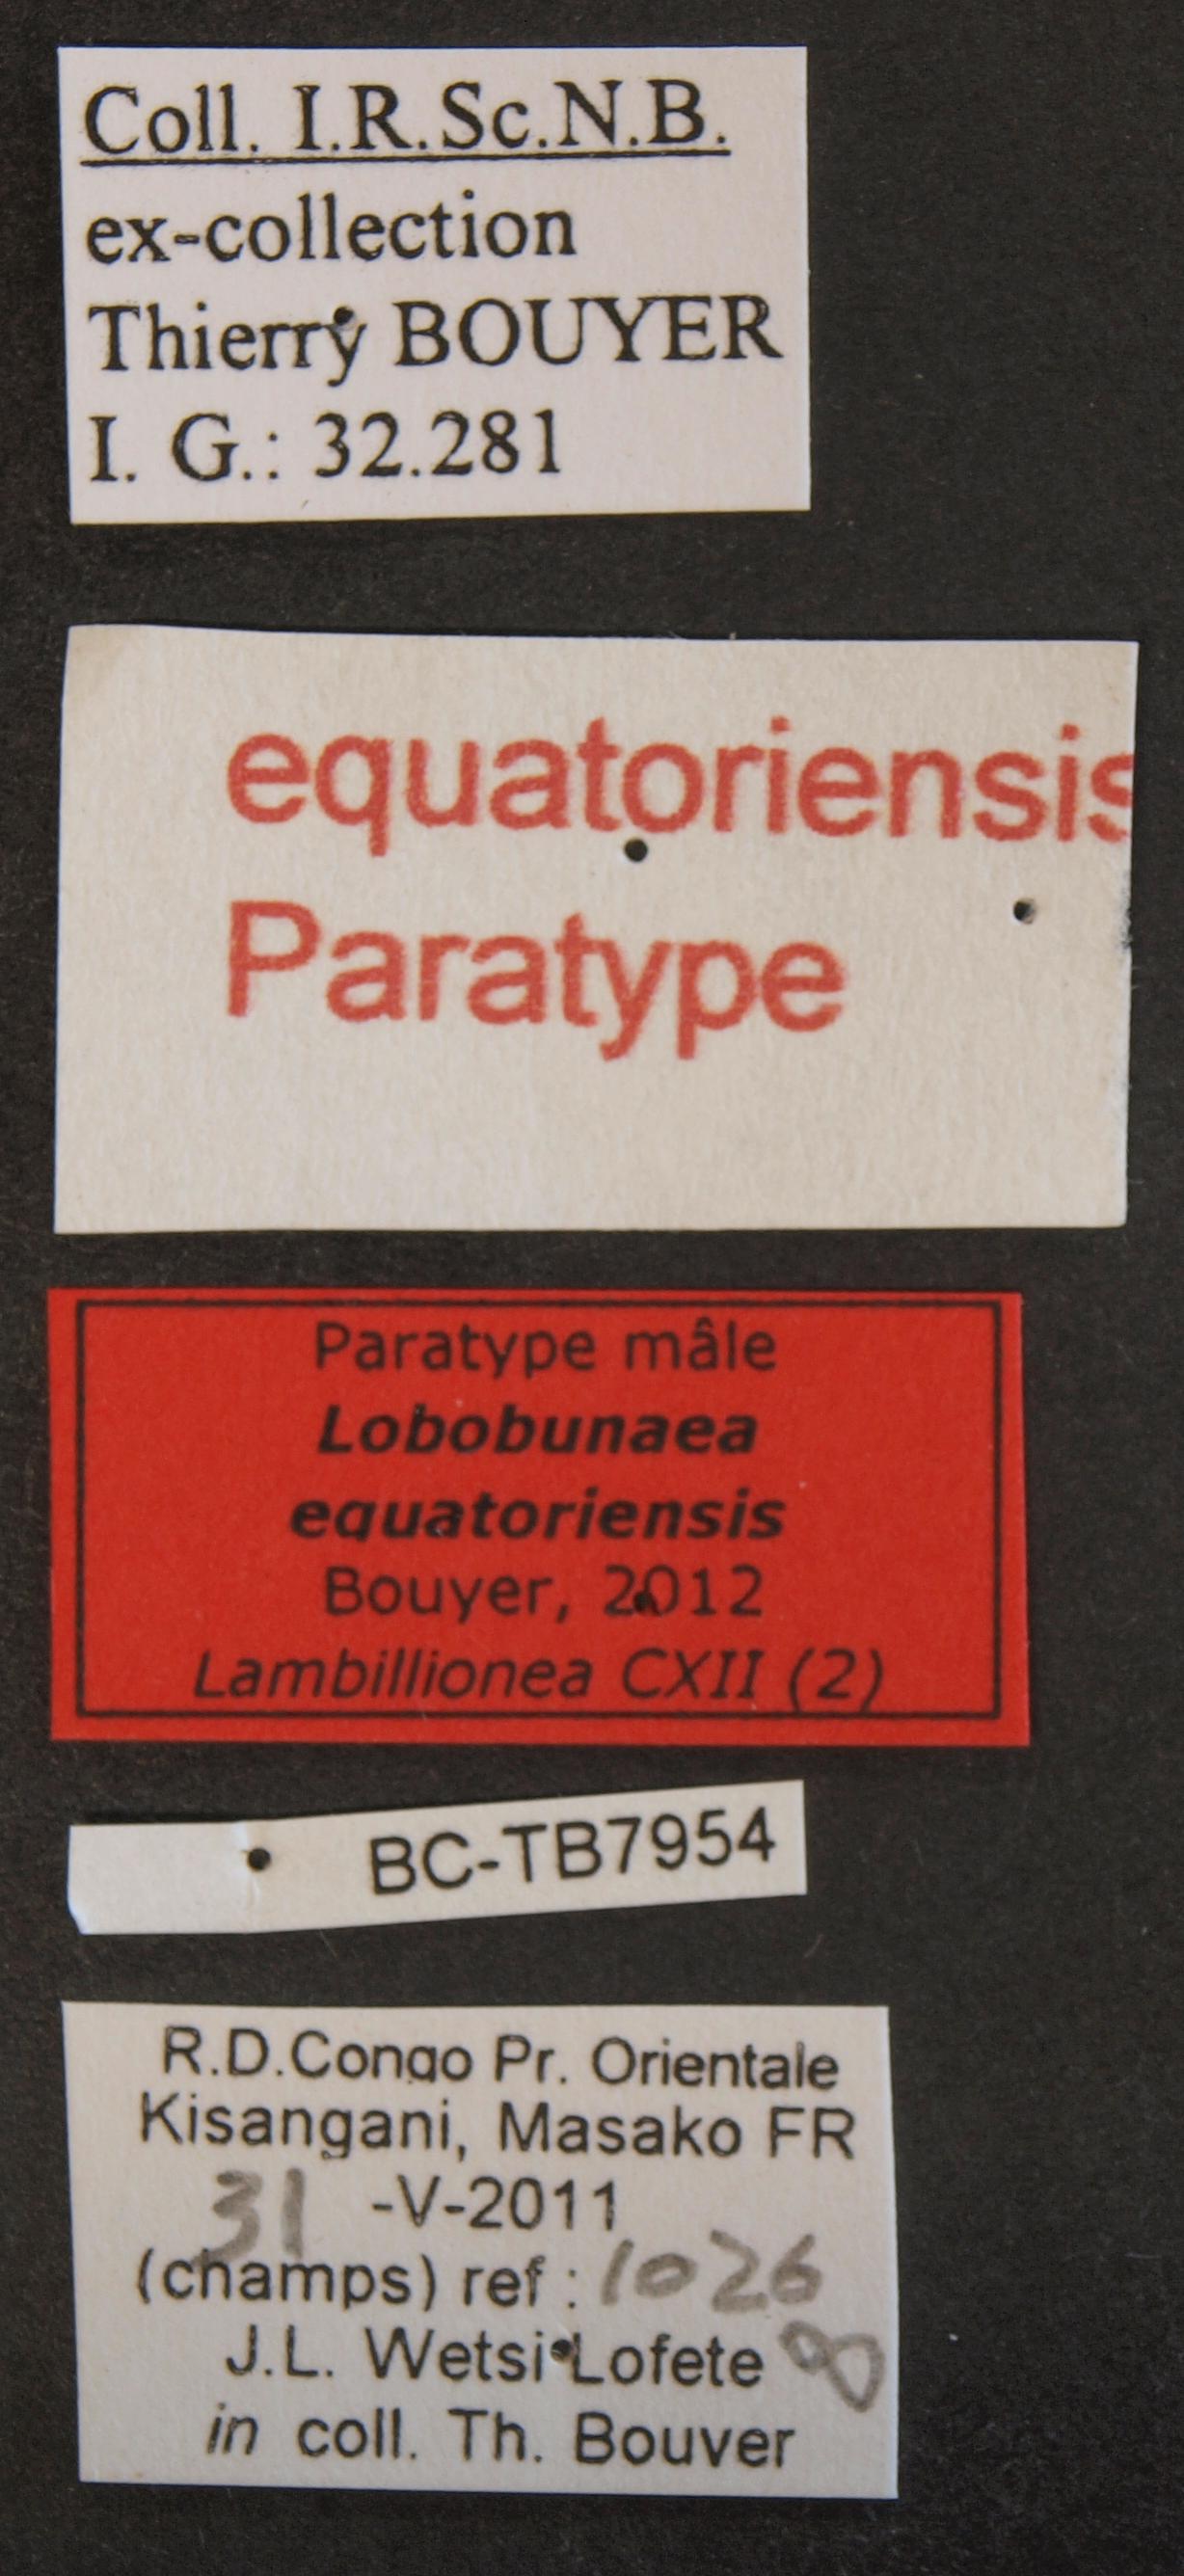 Lobobunaea equatoriensis pt M Lb.JPG